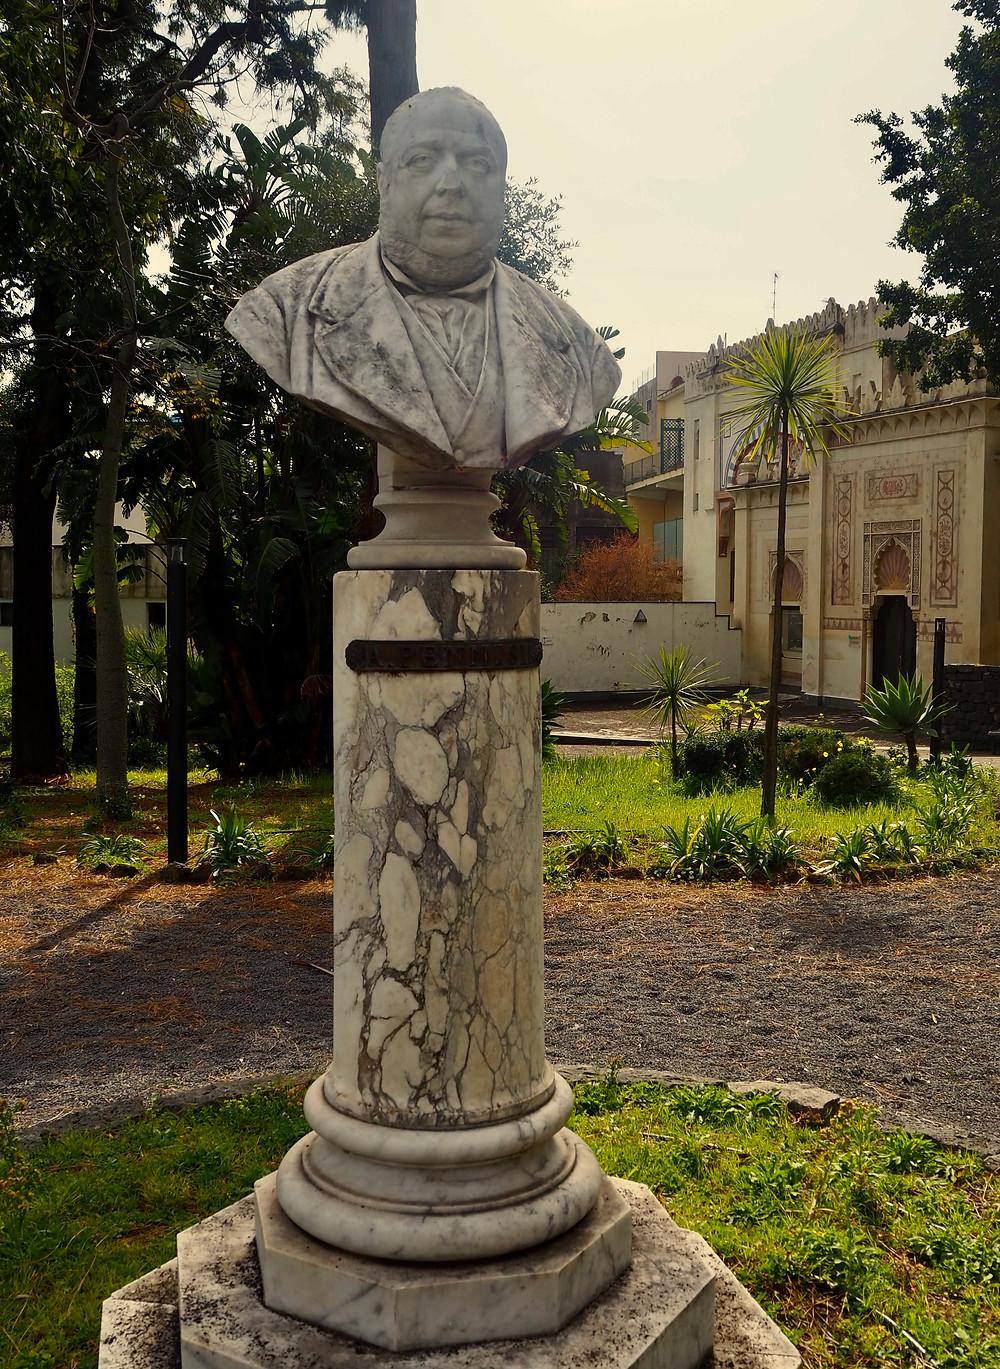 acireale-villa-belvedere-city-park-2